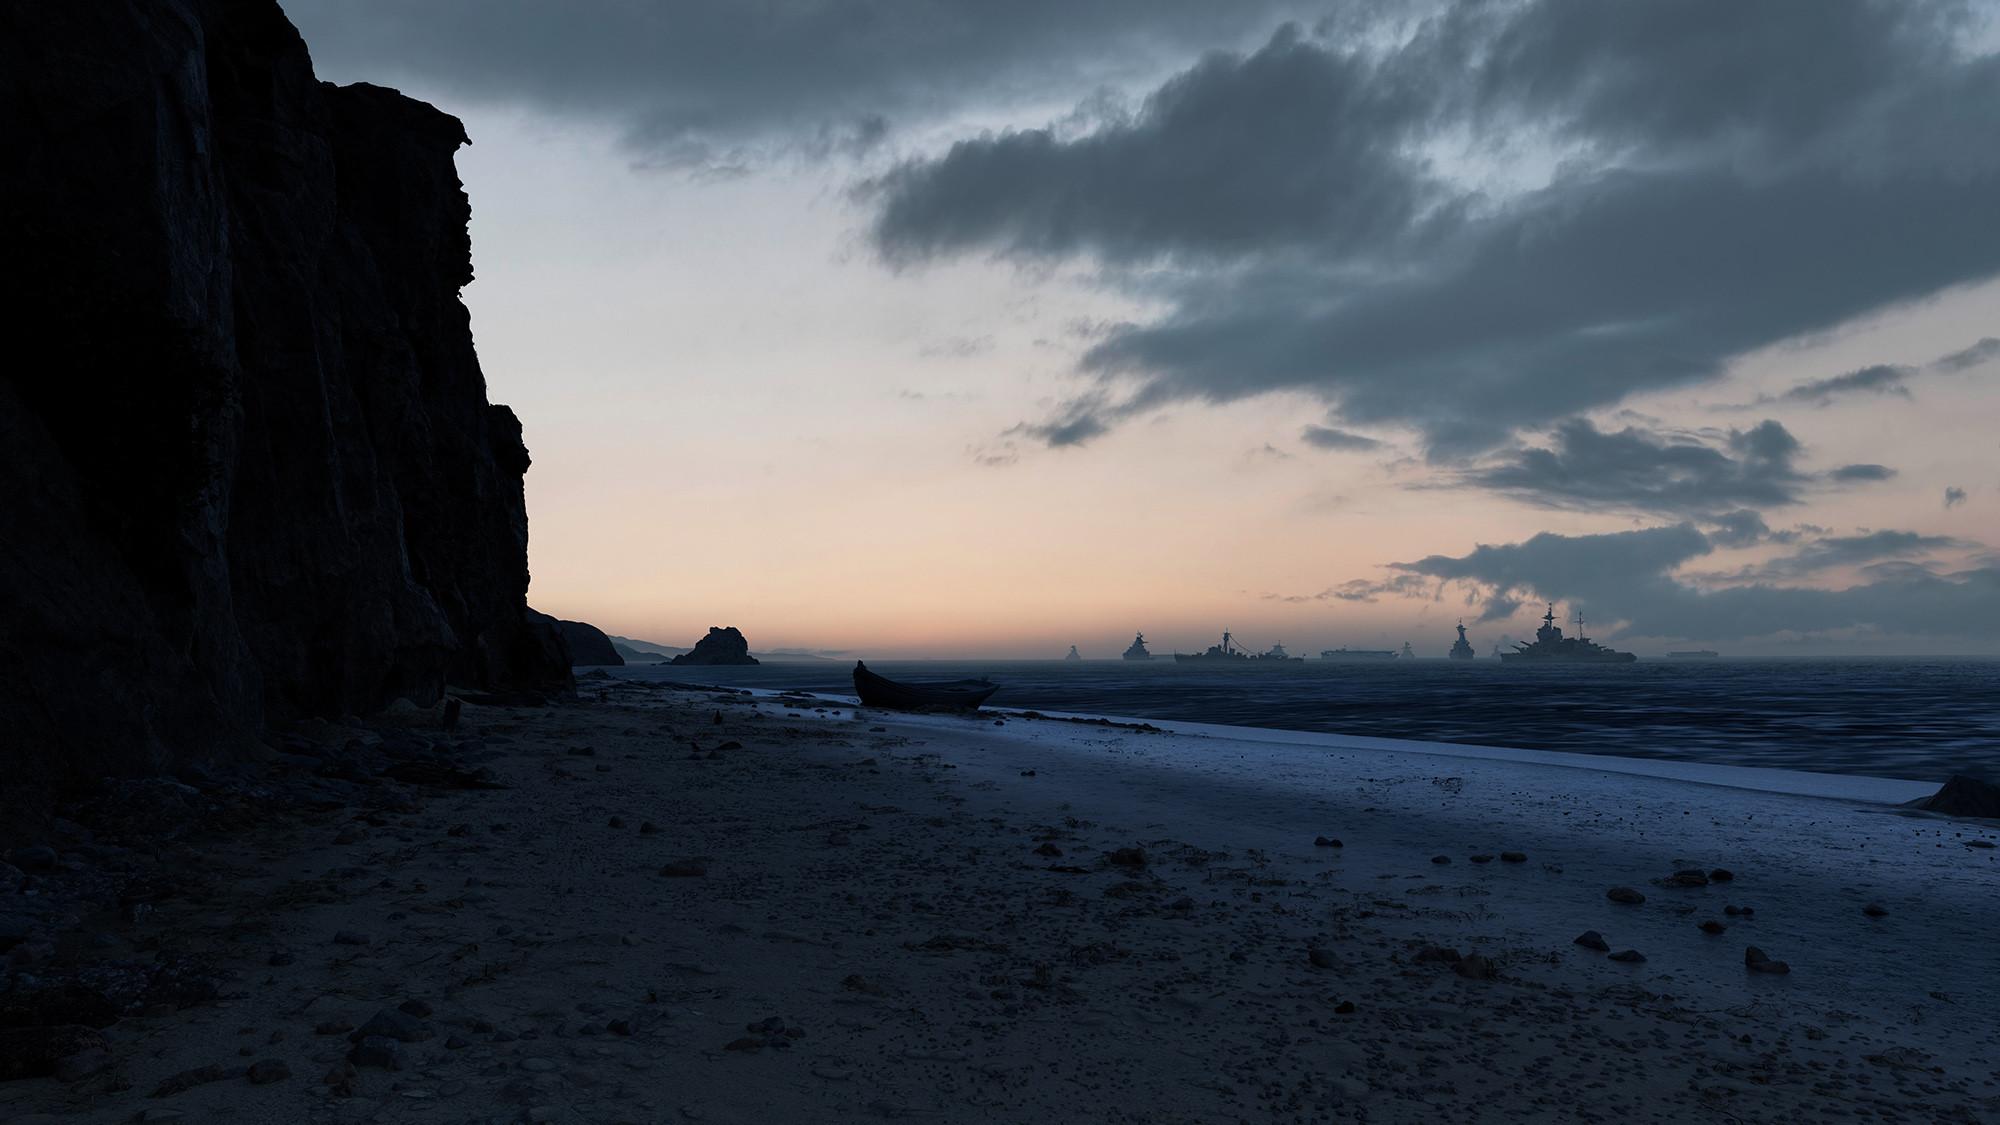 Landing site matte painting: horizon mountains, sea extension, sky, warships, cliff SL texturing. Lighting scenario 01